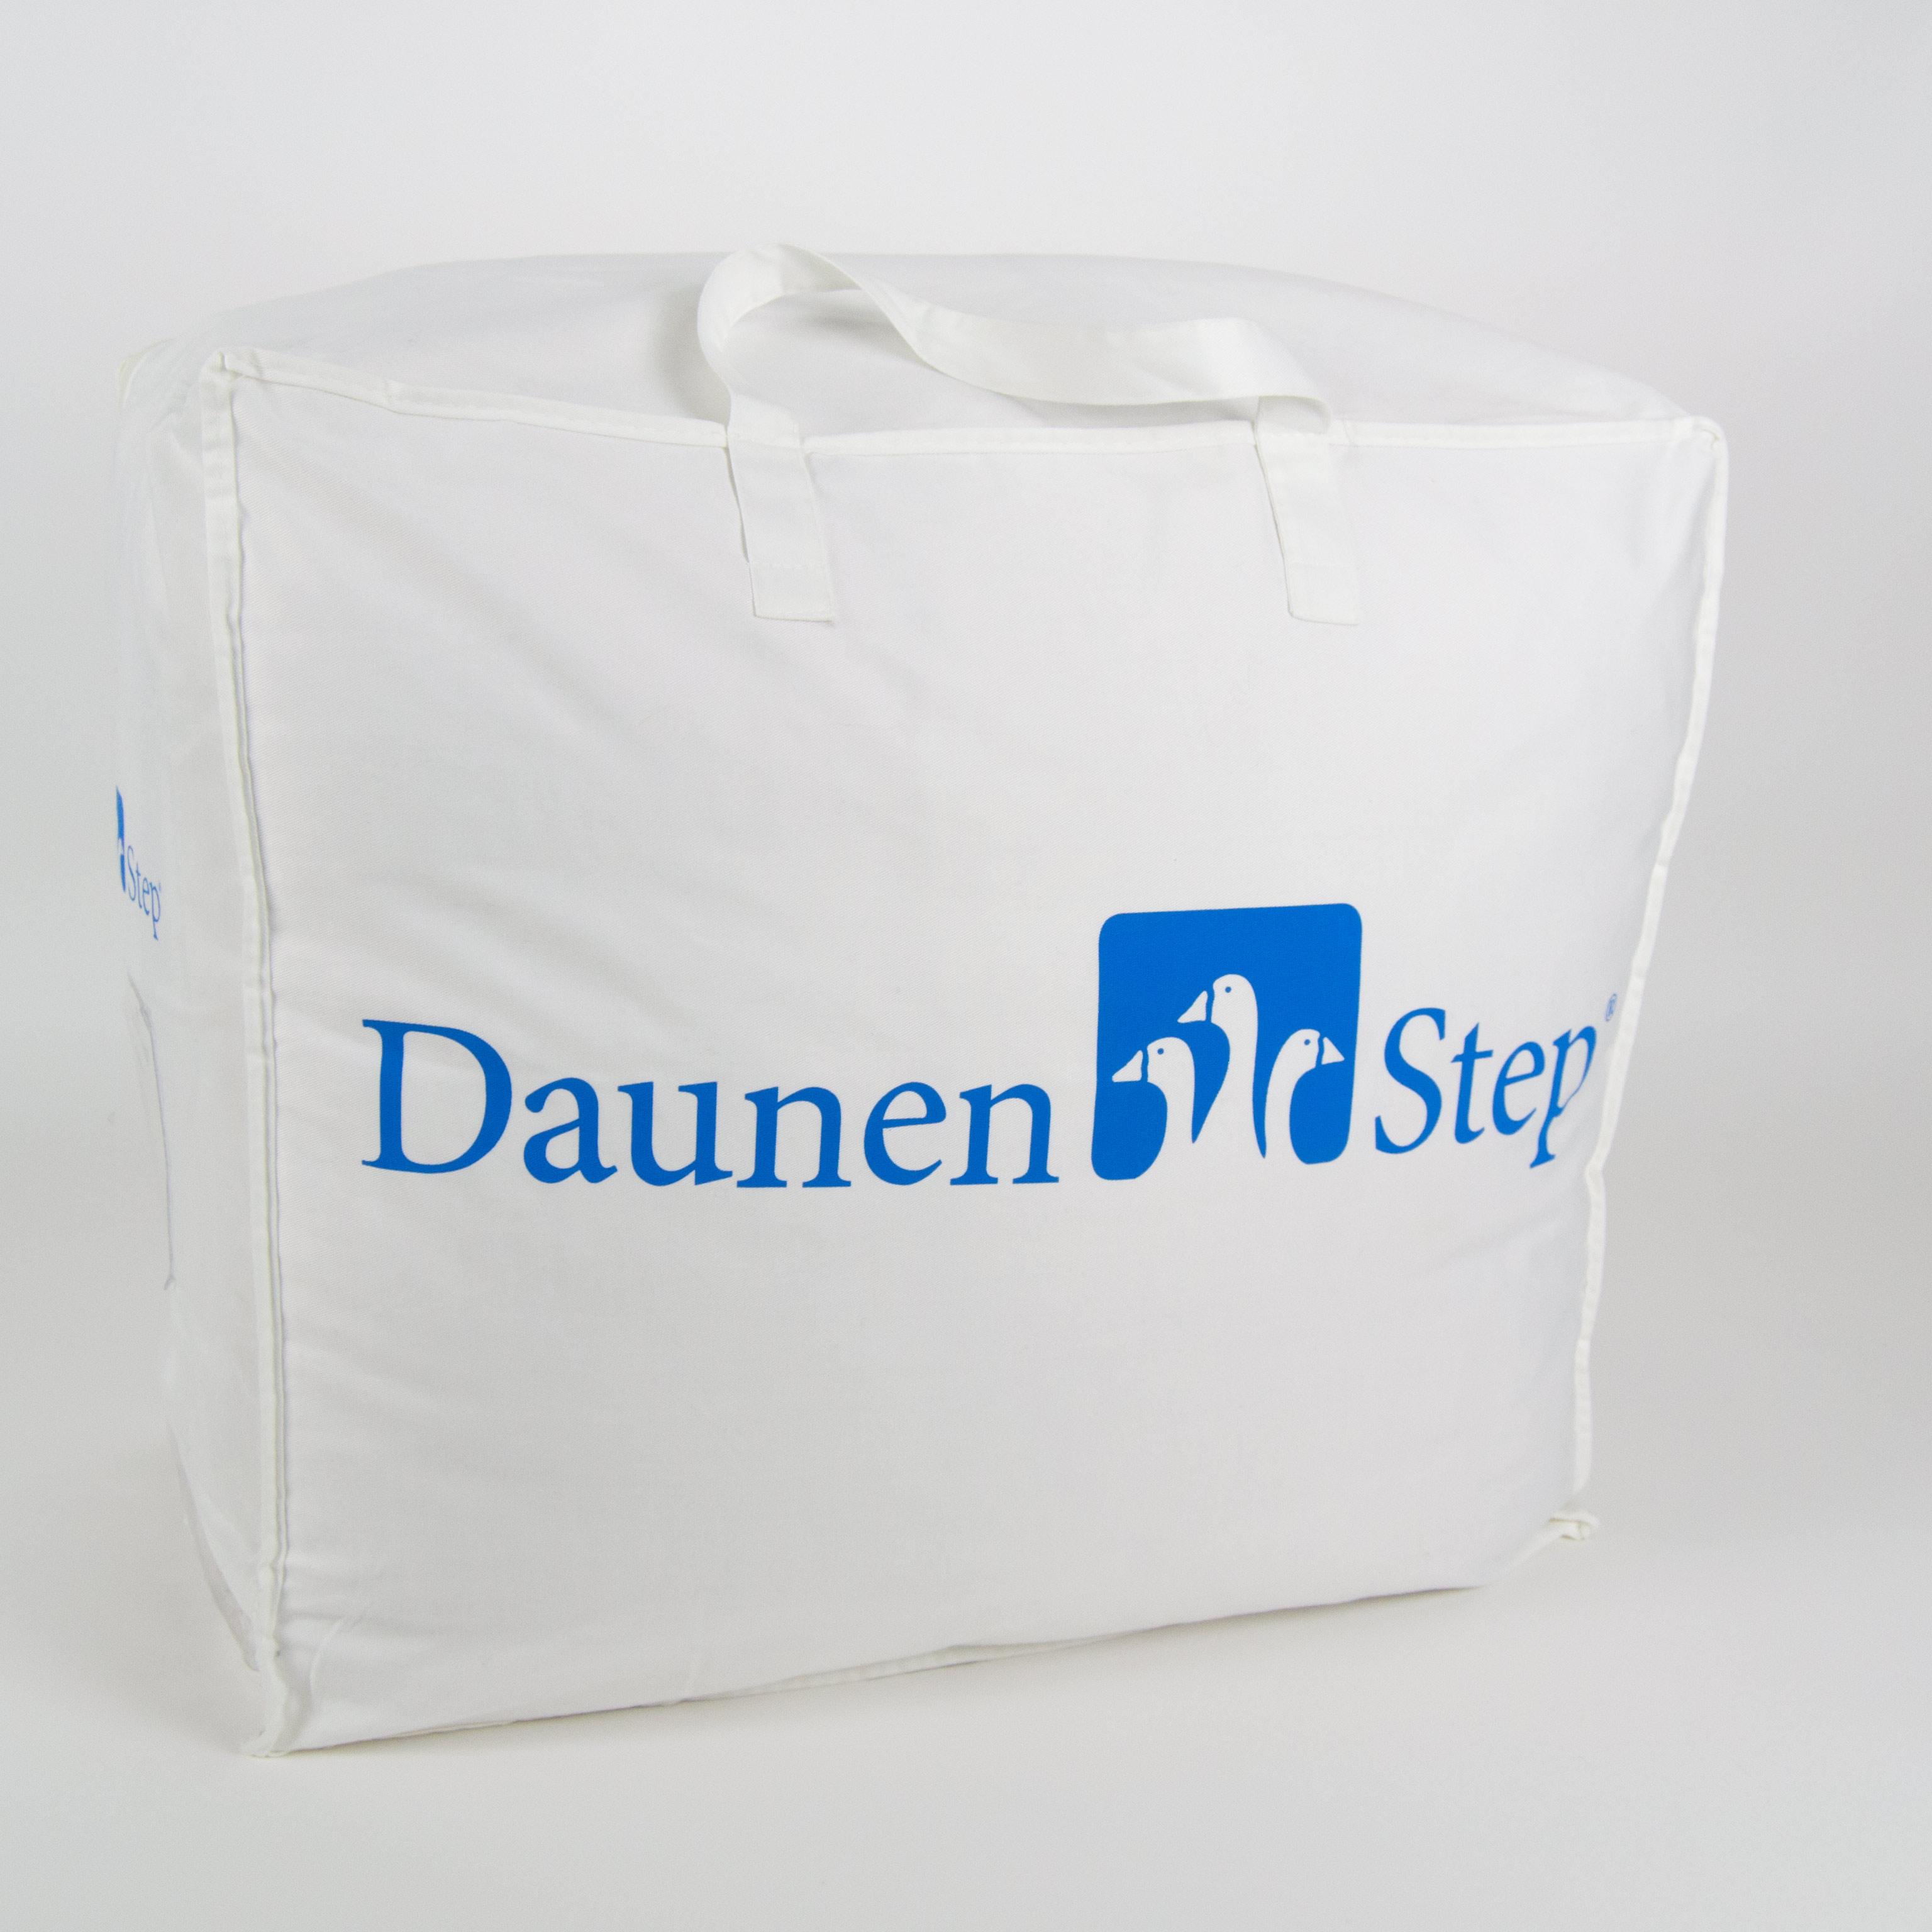 Piumino Daunenstep WoolStep in pura lana dell\'Alto Adige mod.classic ...